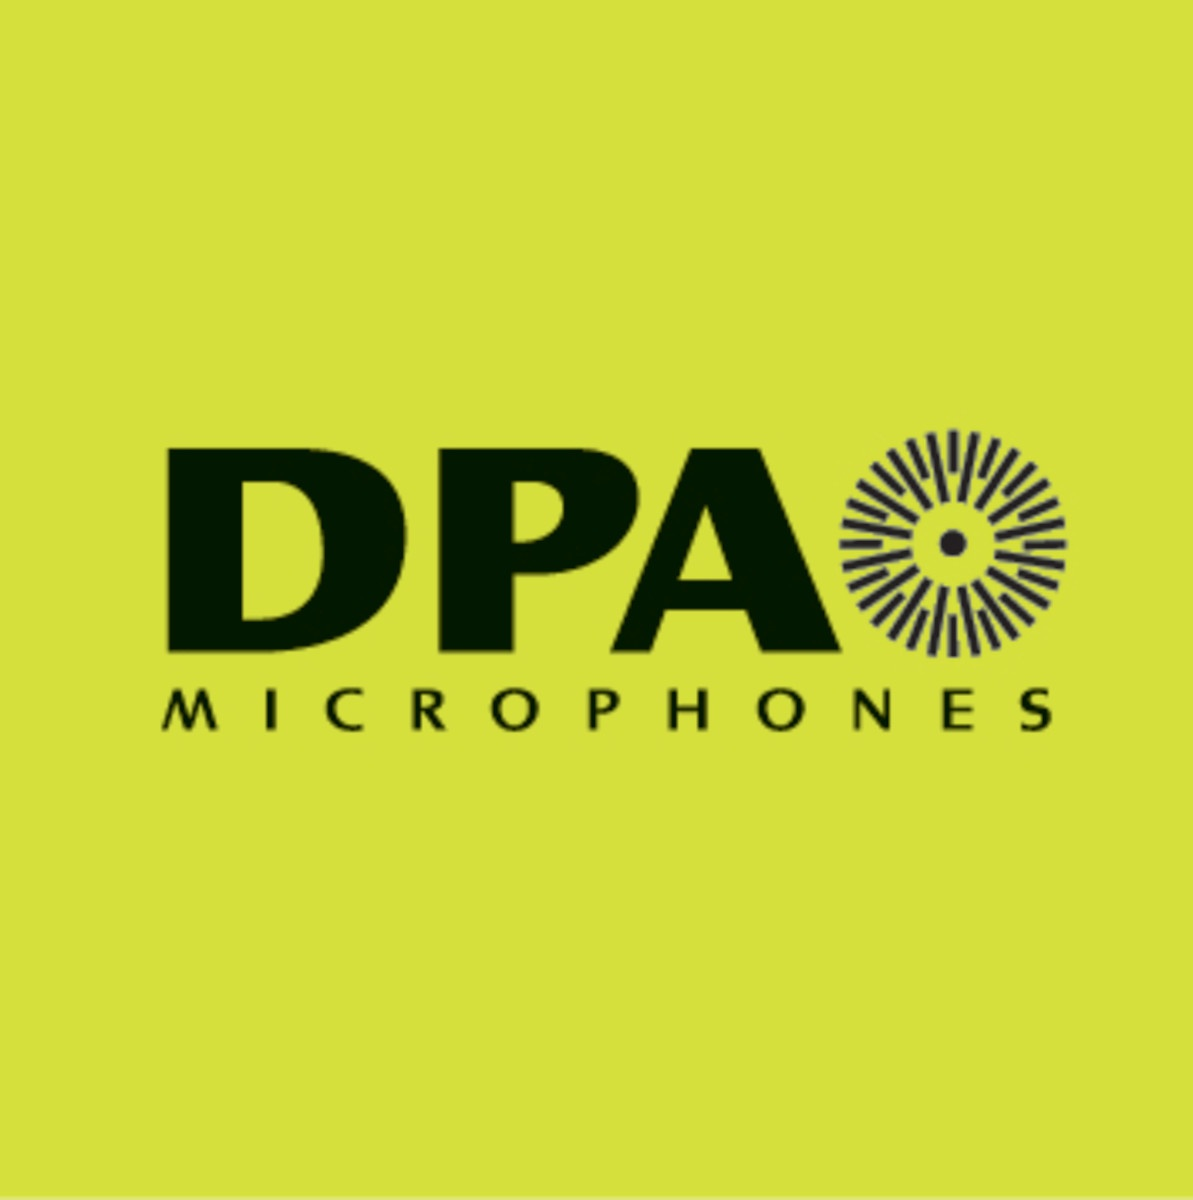 dpa-logojpg.jpg